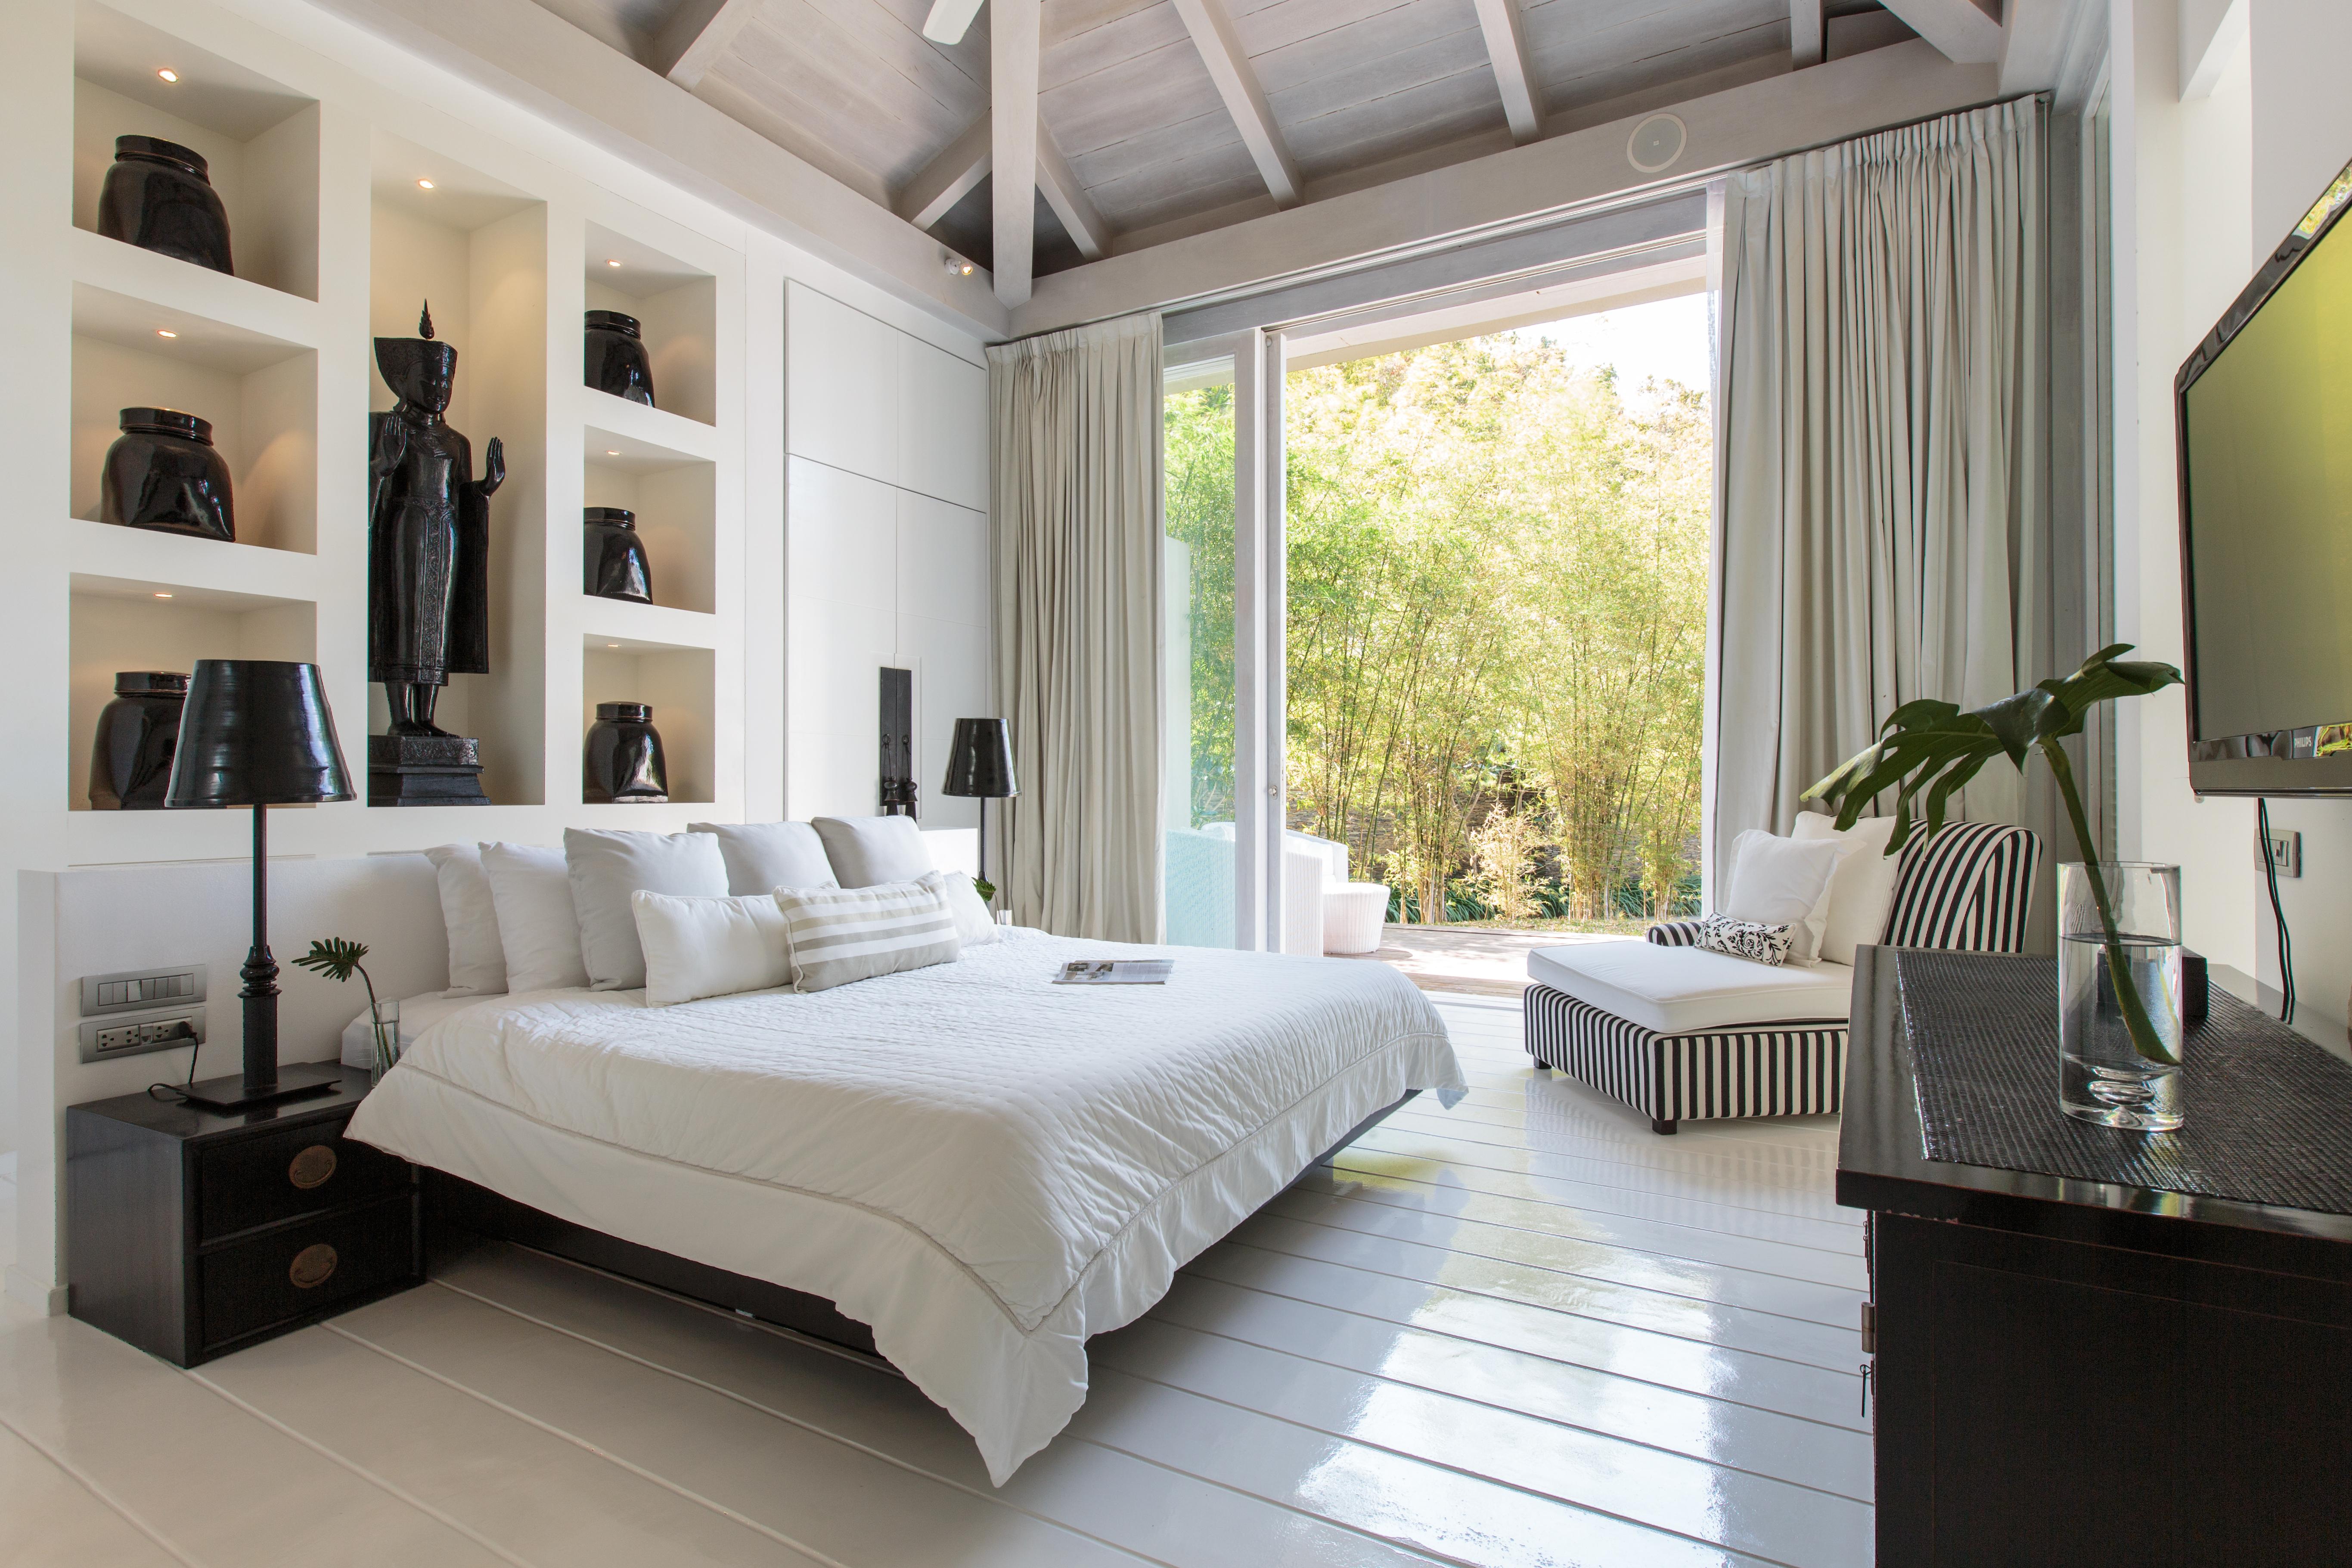 Bedroom-1-4.jpg